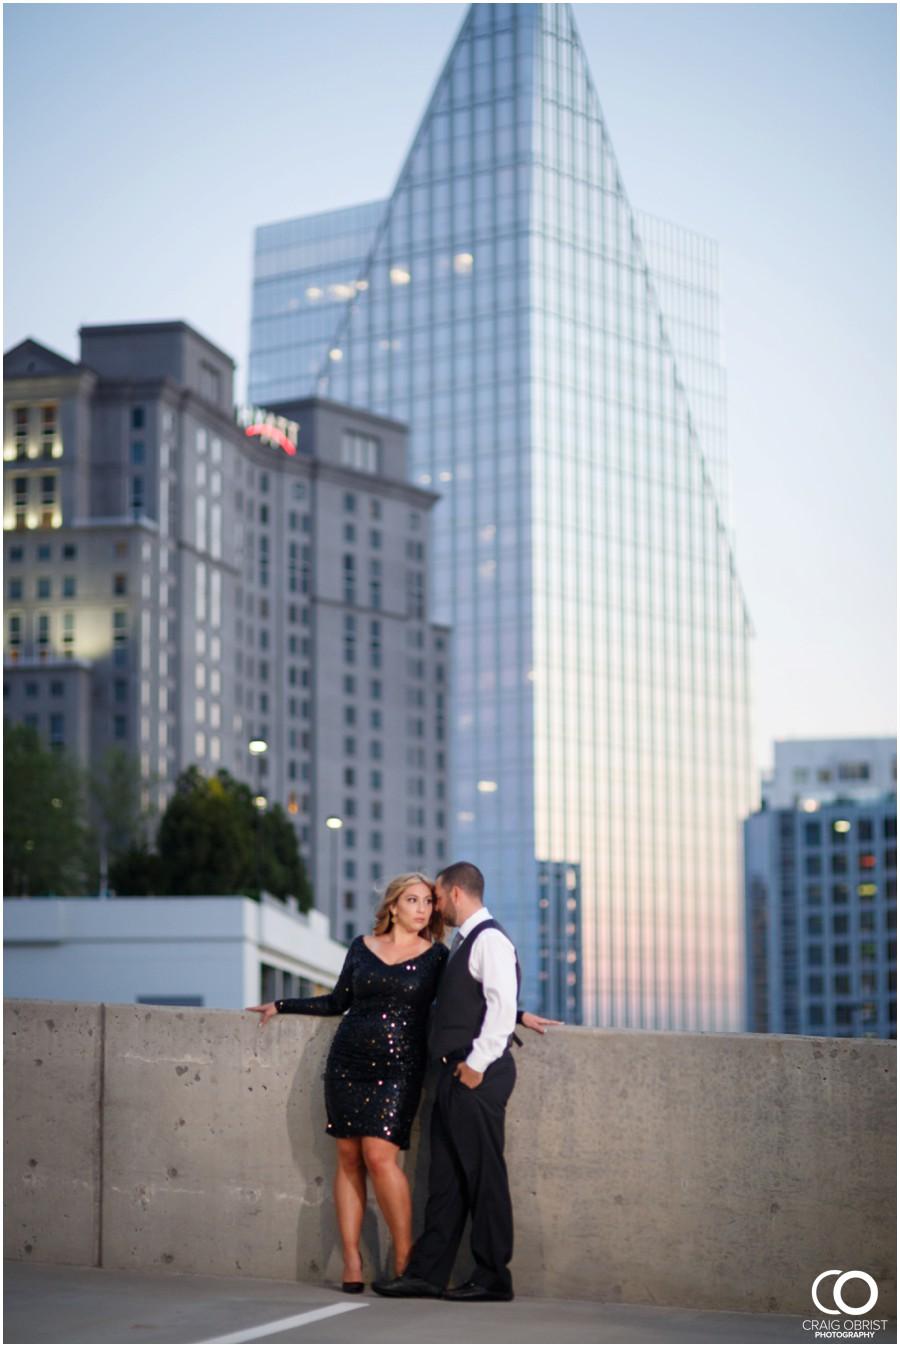 Philips-Arena-Atlanta-Buckhead-City-Engagement-Portraits_0016.jpg